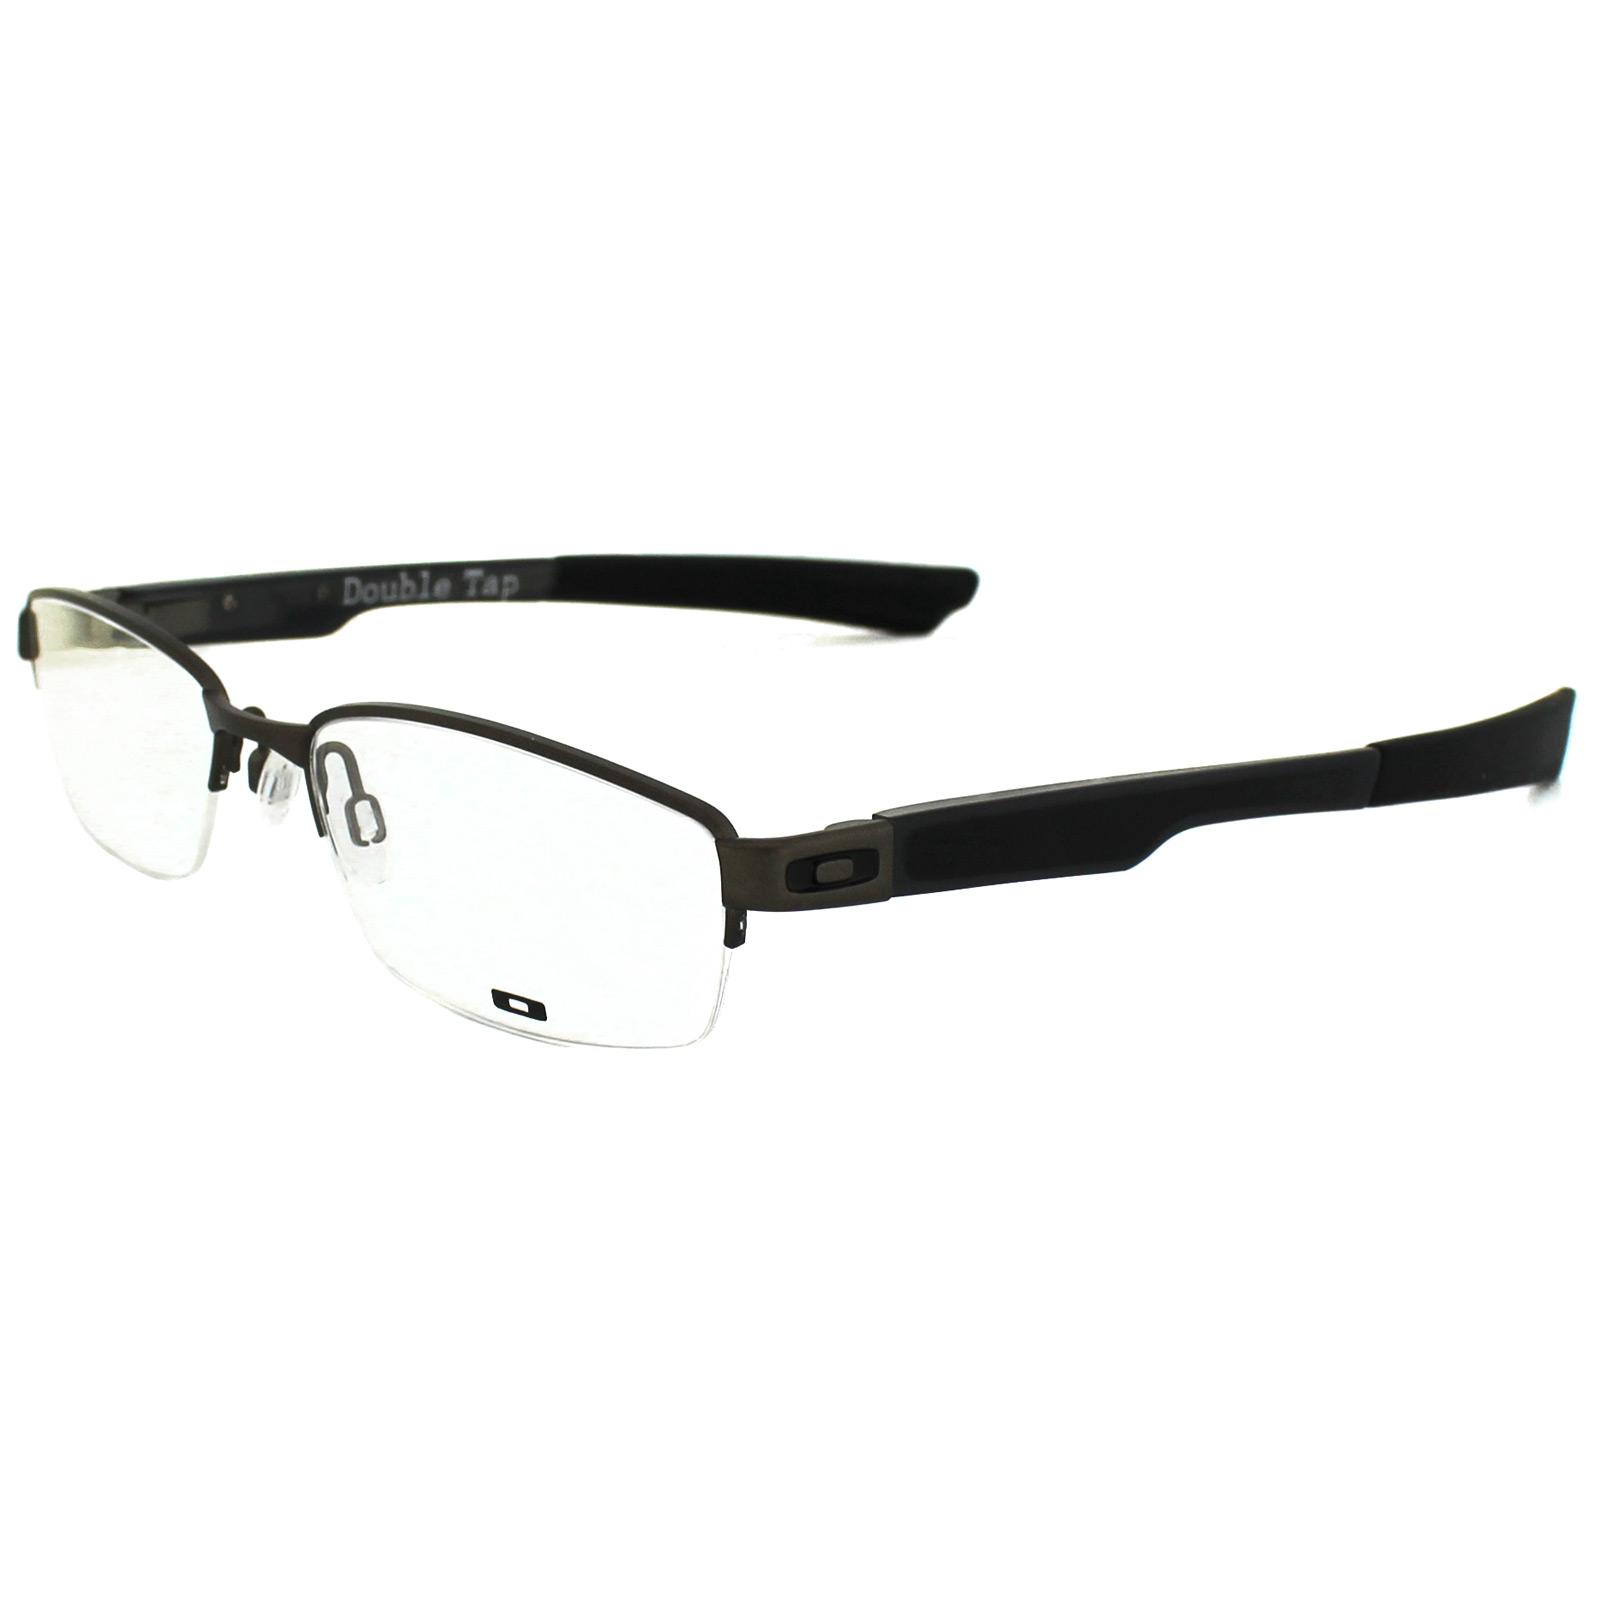 Oakley Glasses Frames Double Tap 3123-02 Pewter | eBay